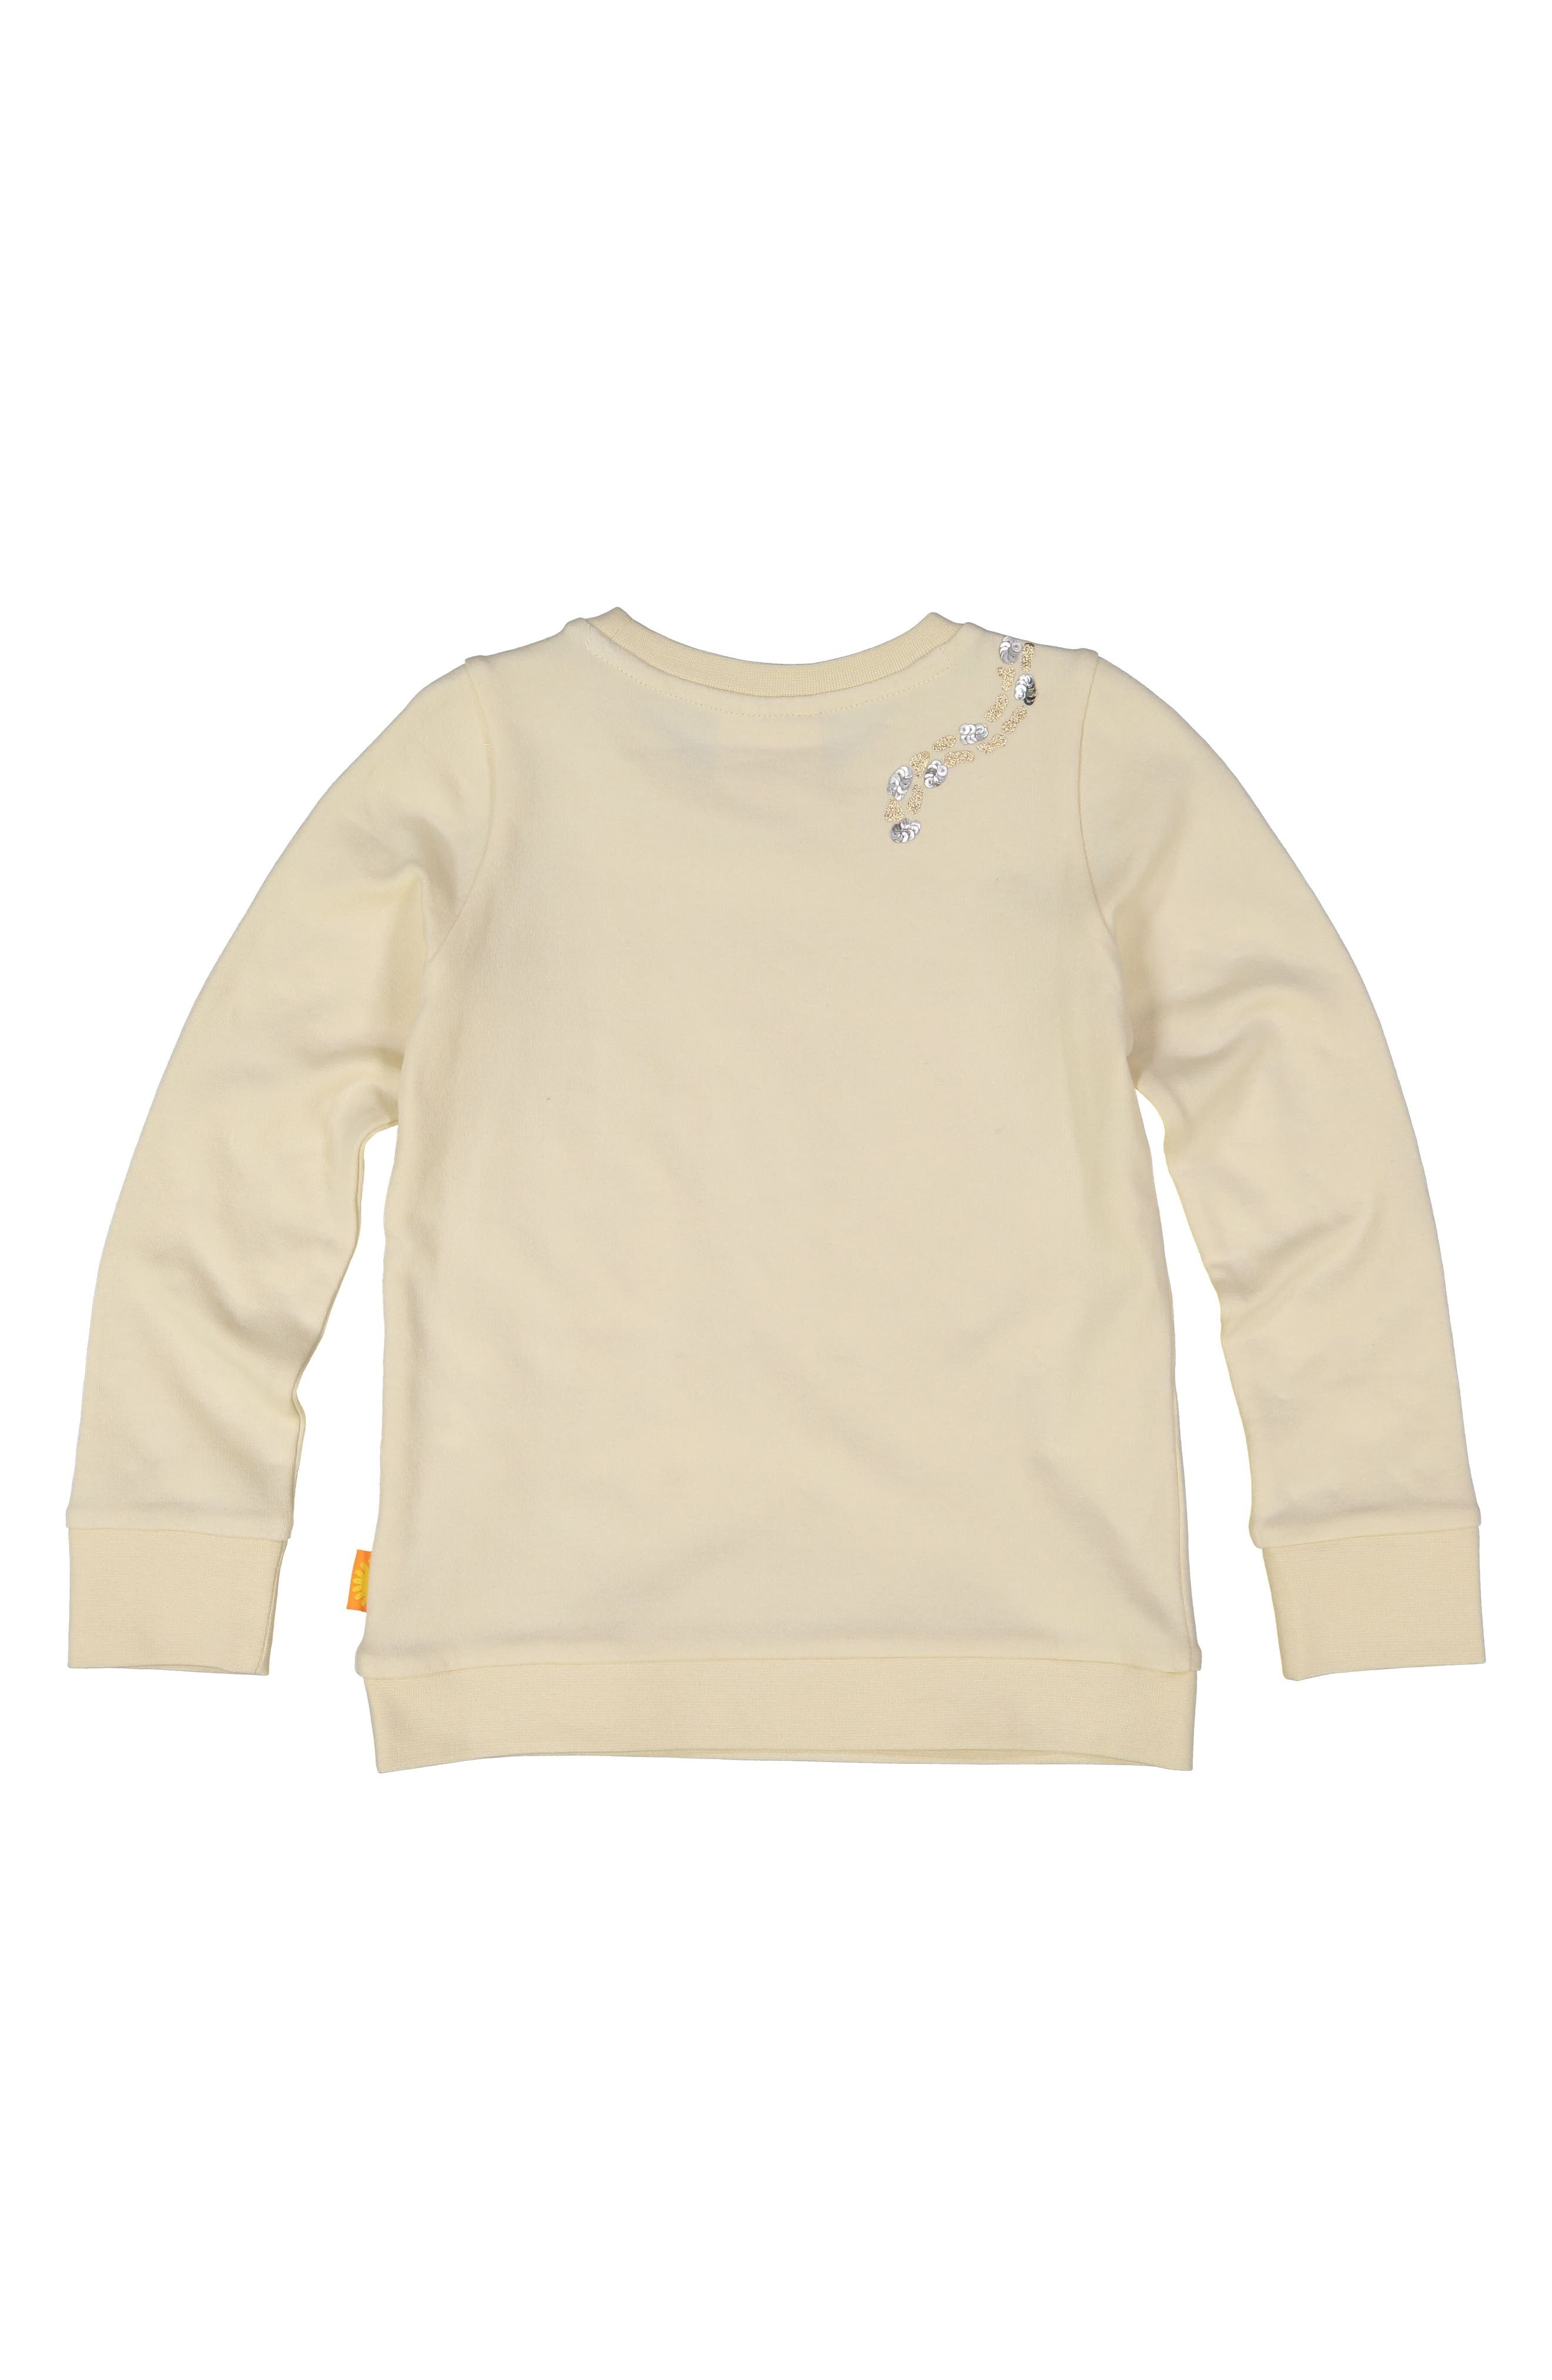 Cheetah Organic Cotton Sweatshirt,                             Alternate thumbnail 2, color,                             100